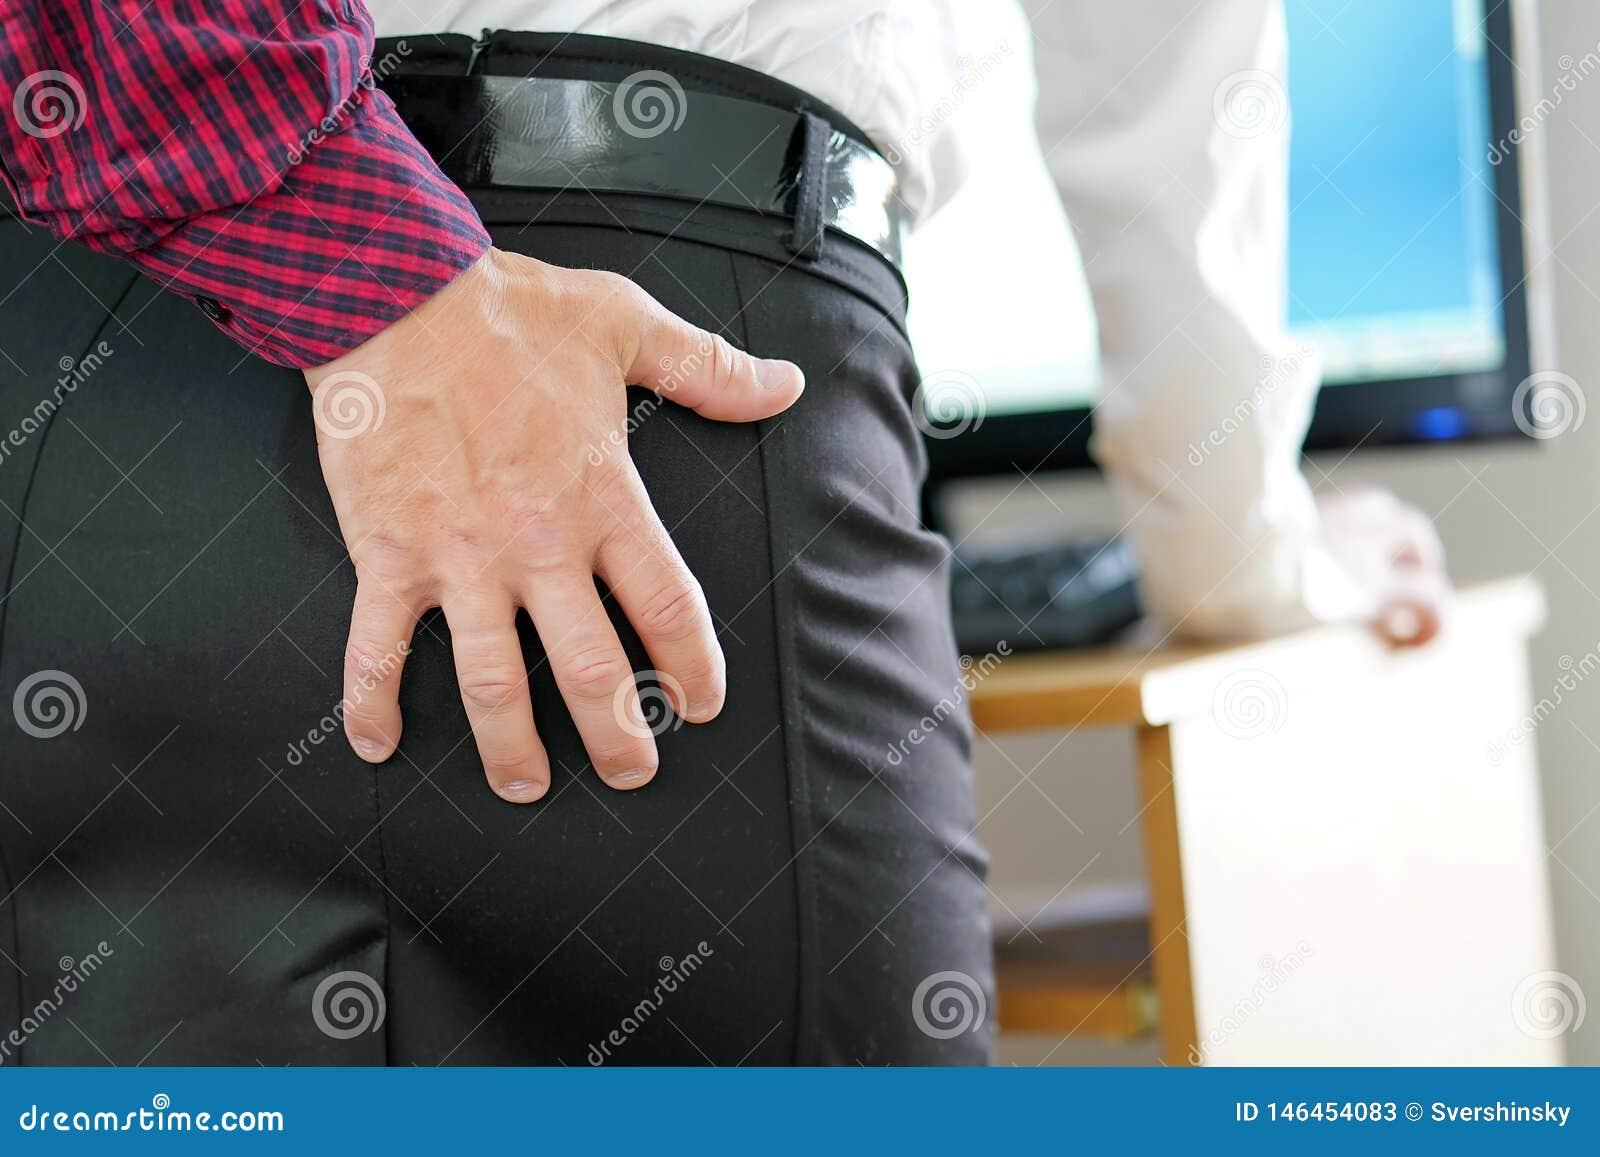 Ass Grope man touching woman`s stock image. image of employed - 146454083